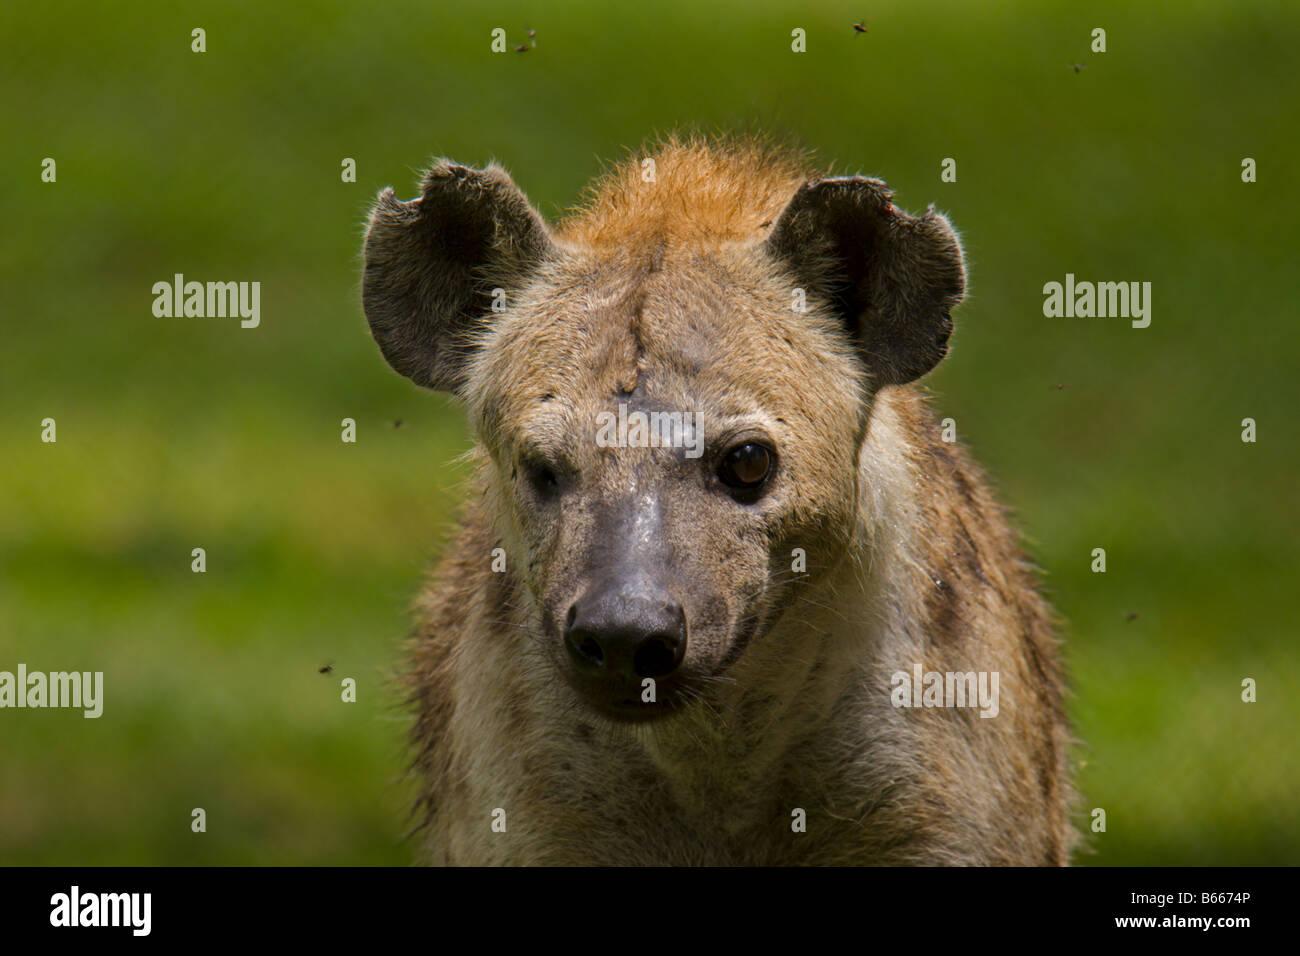 hyena savage animal Uganda africa - Stock Image